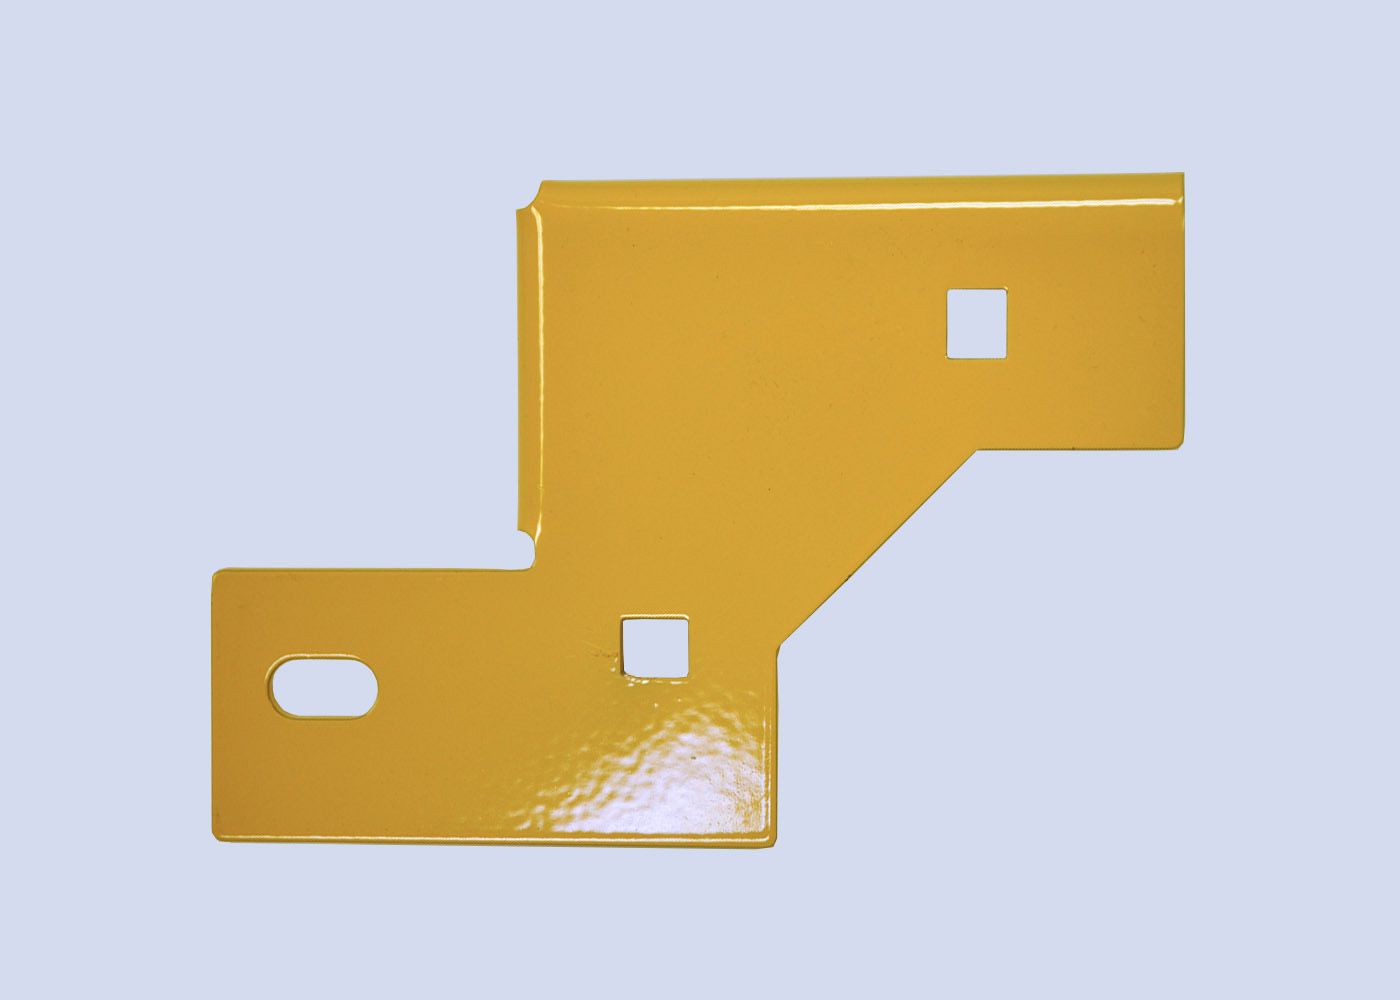 A12869-lh-front-mount-bracket